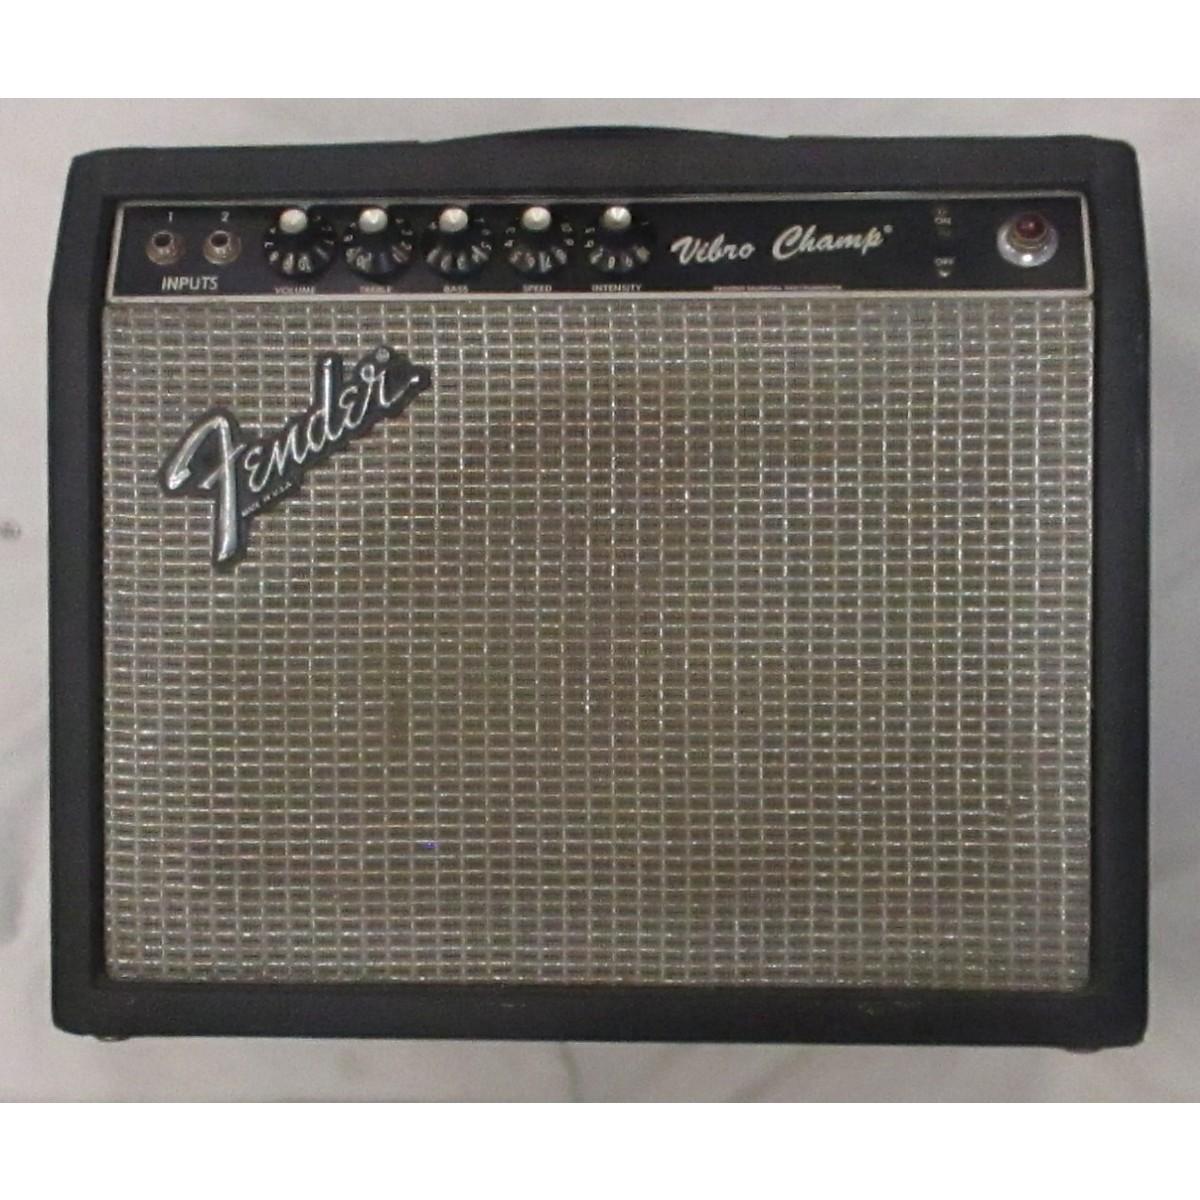 Fender 1981 Vibro Champ Guitar Combo Amp